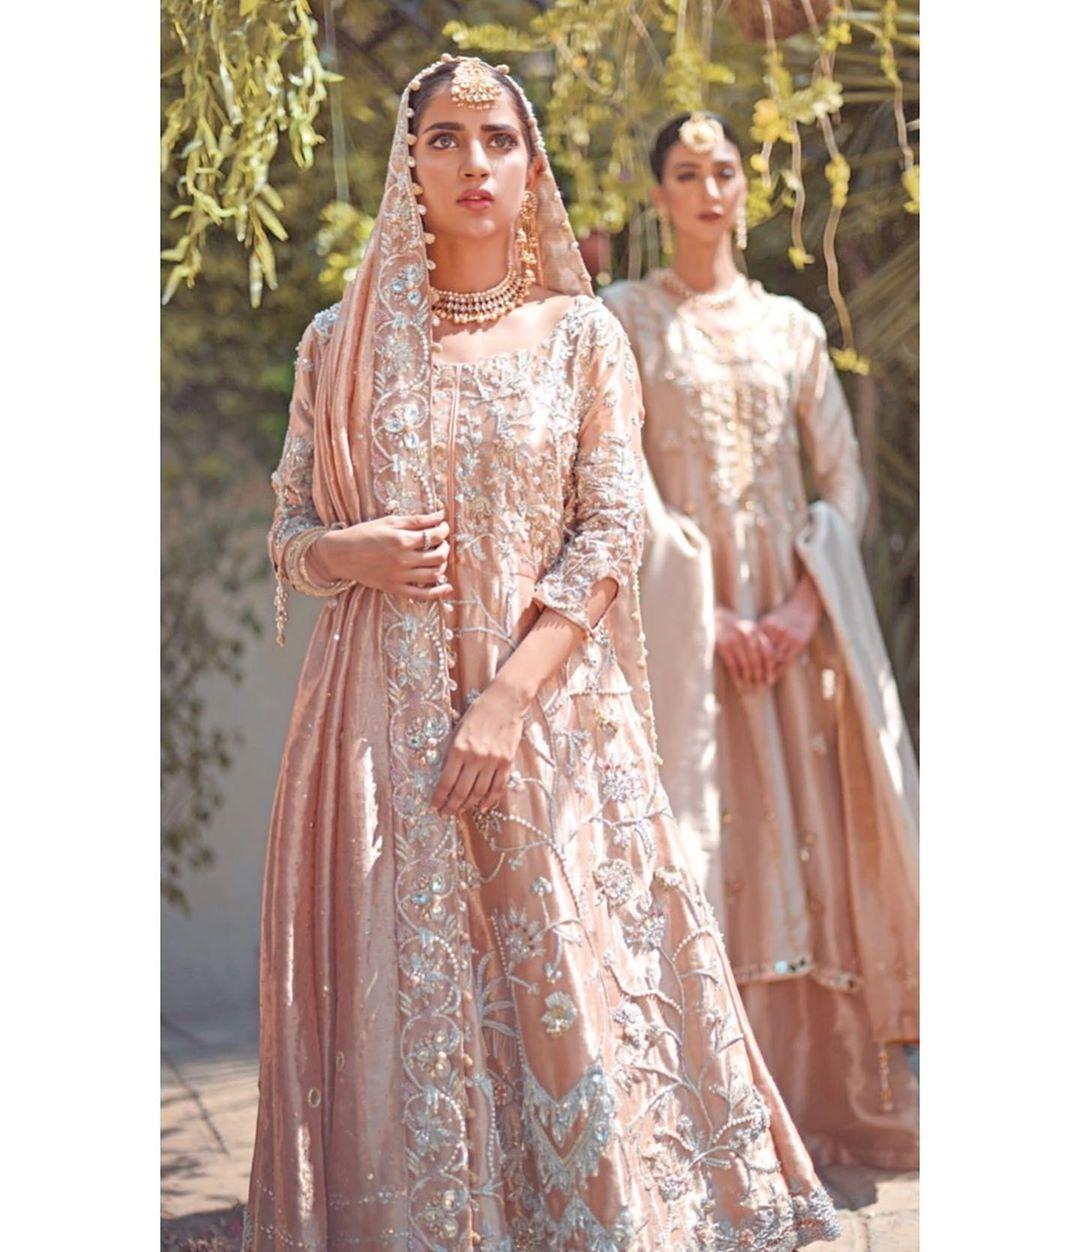 Beautiful Bridal Photo Shoot of Actress Saboor Ali for Amna Arshad